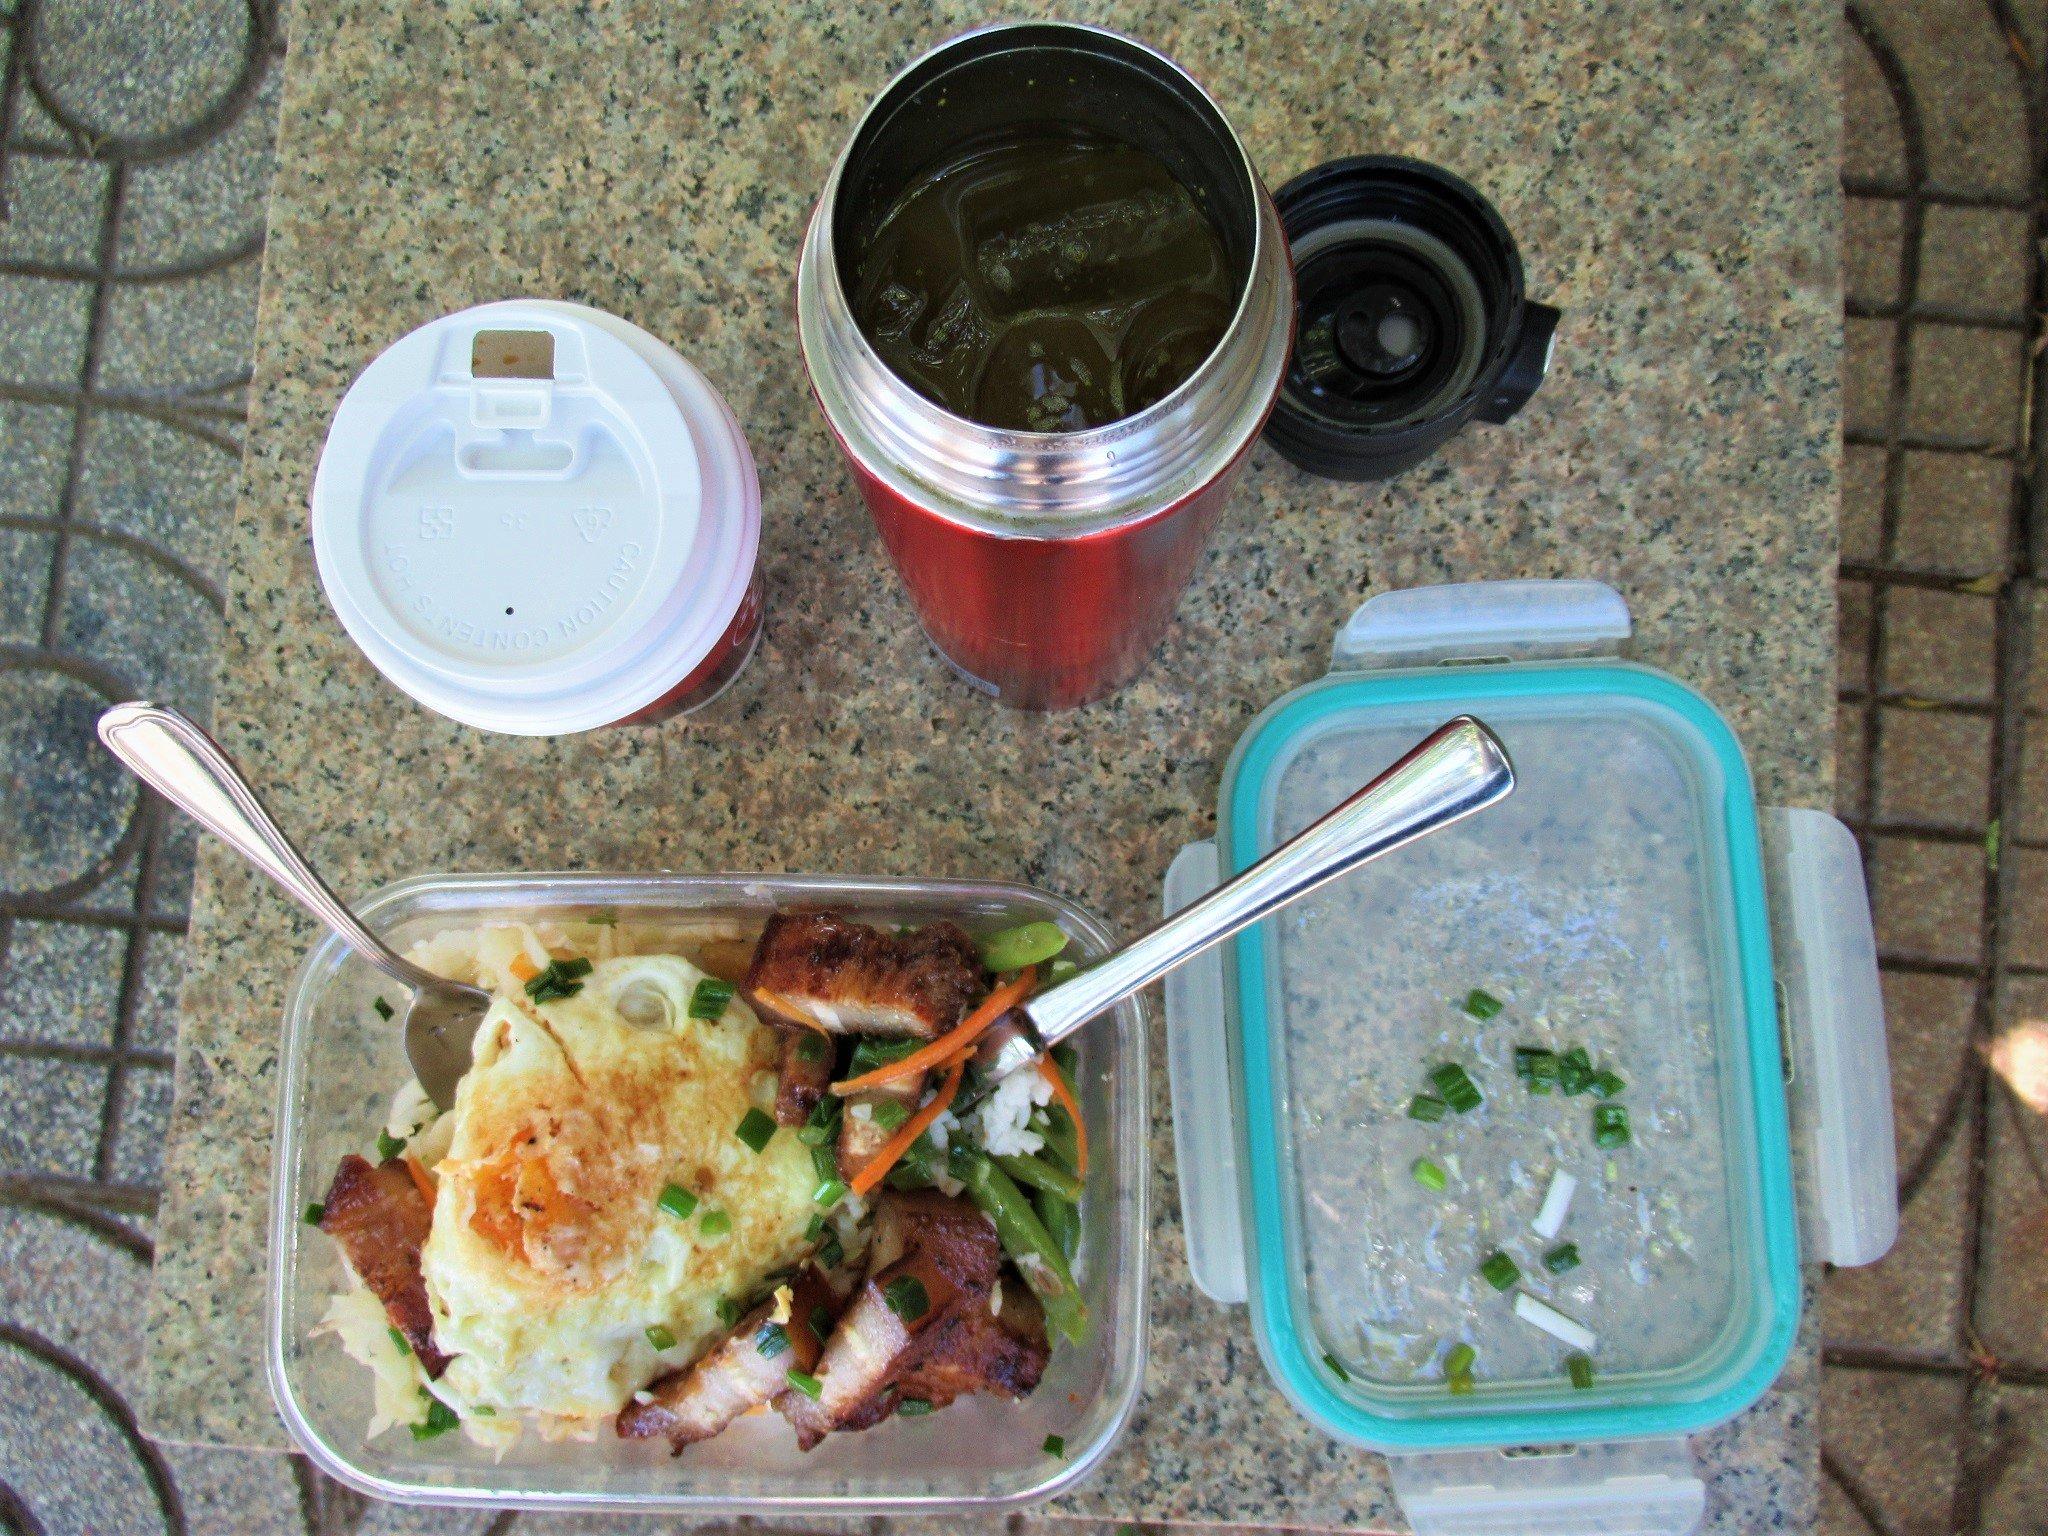 Food & drink during lock-down, Vung Tau, Vietnam